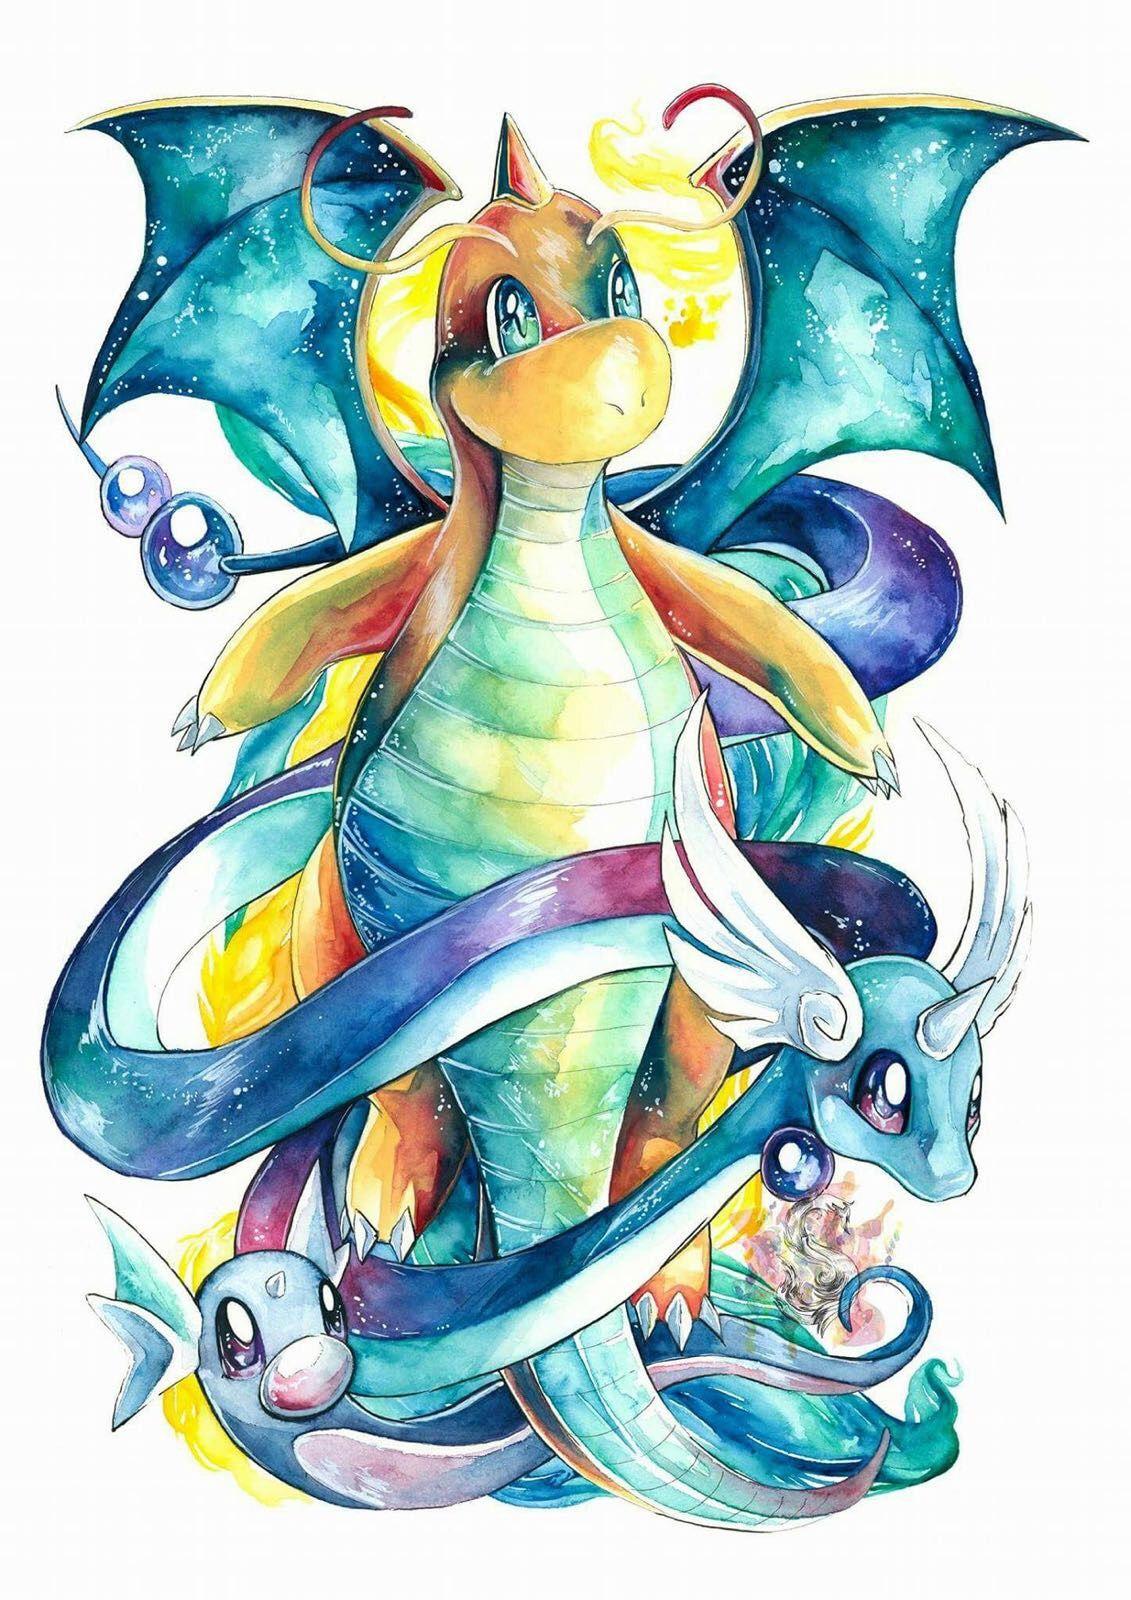 Pokemon Dratini Deagonir Dragonite Pokemon Drawings Cute Pokemon Wallpaper Pokemon Art